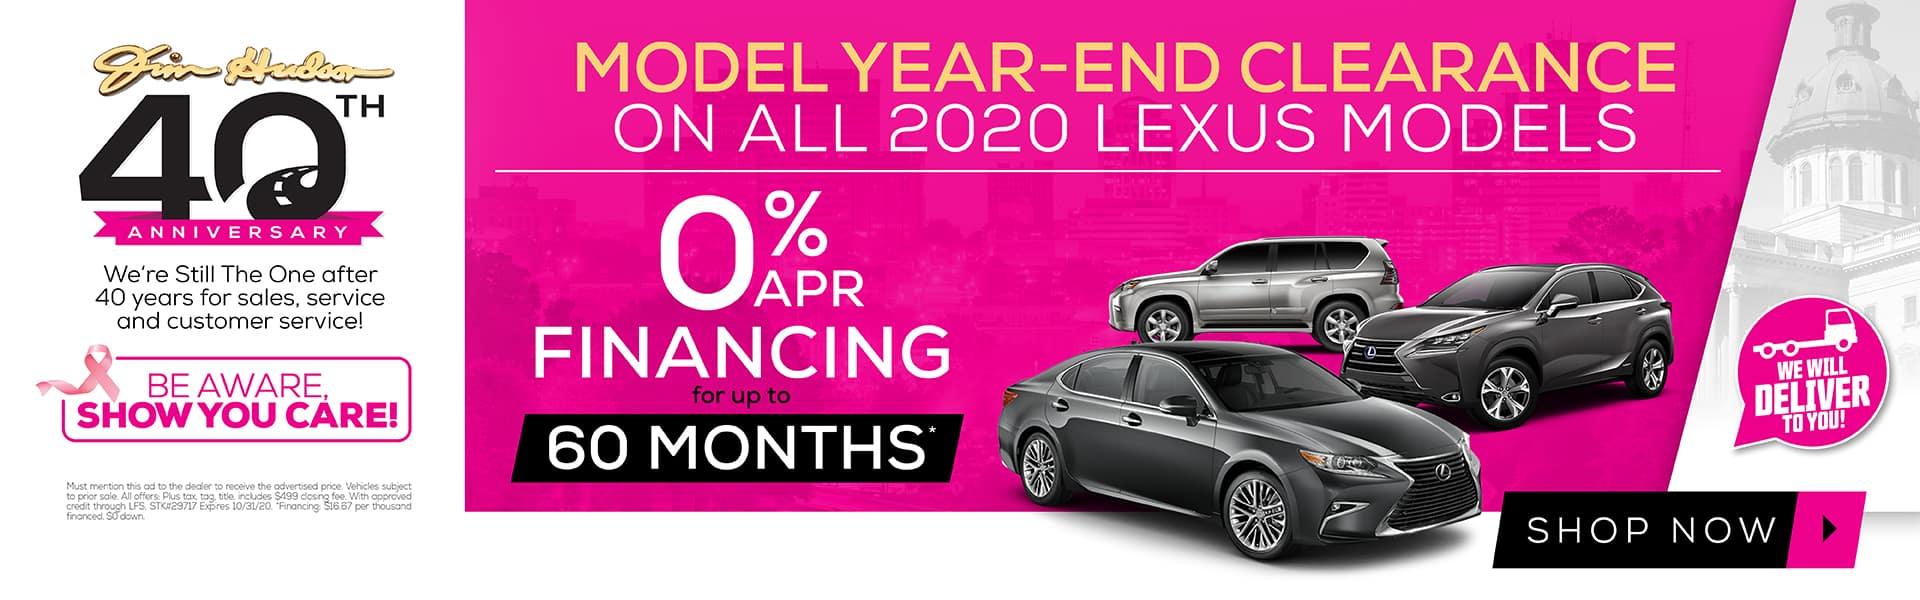 1399079-JHA Lexus 40th ANNIV OCT CHILD HP-1920X600